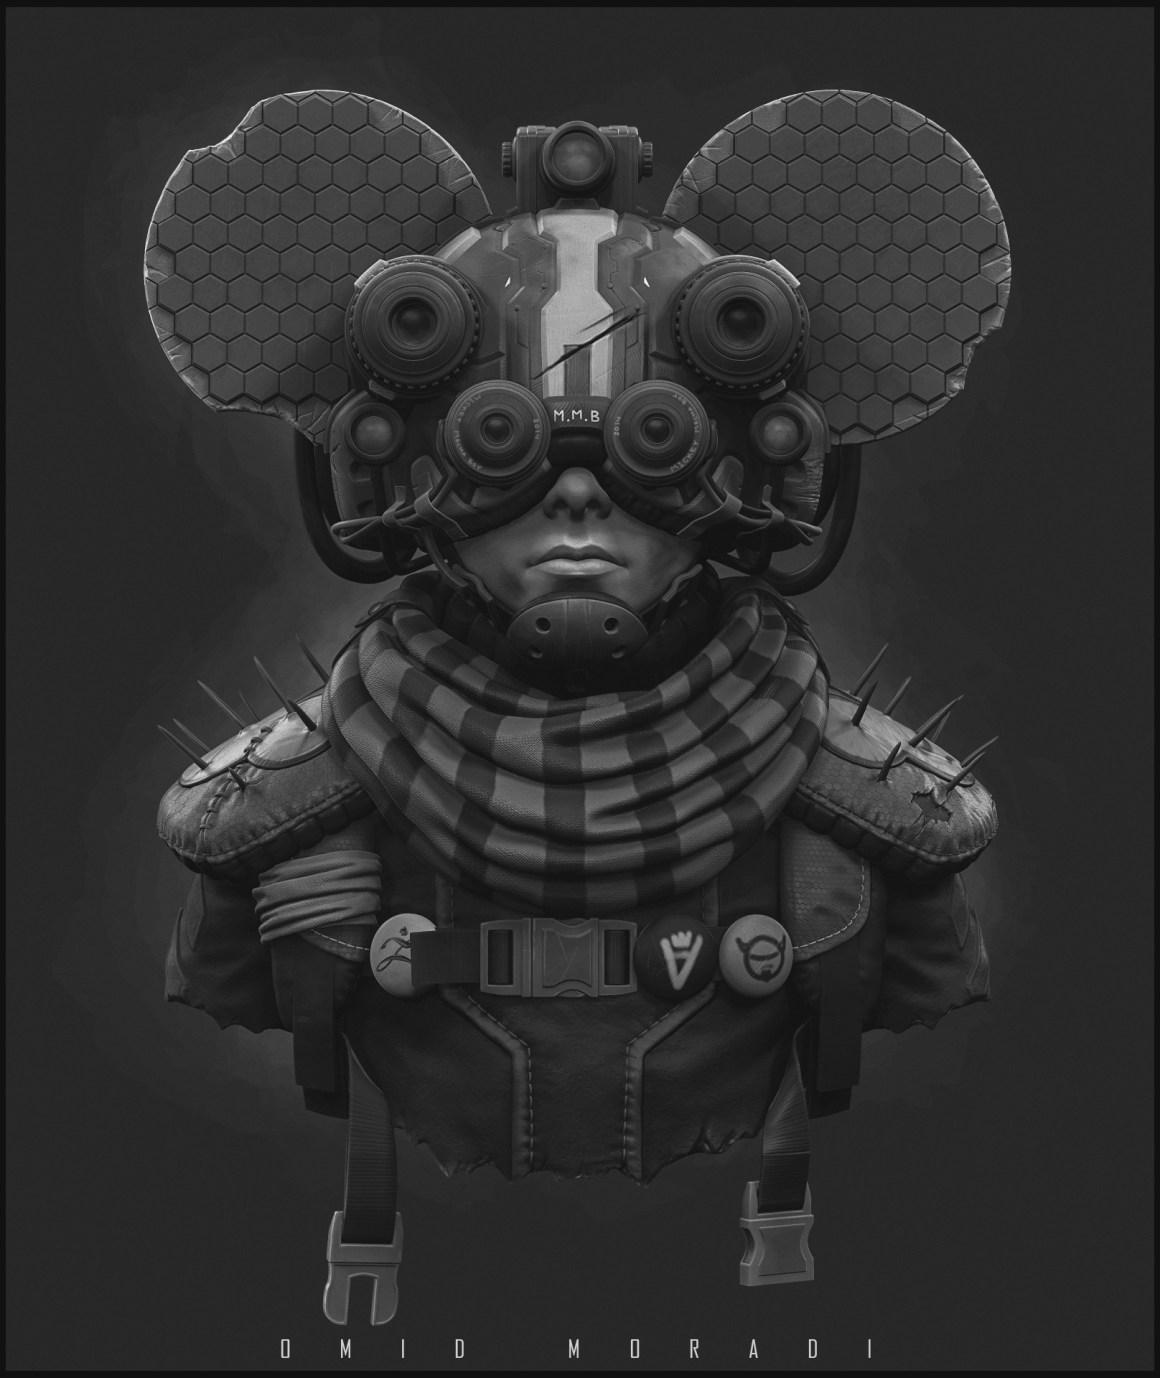 Mickey Mecha Boy by Omid Moradi